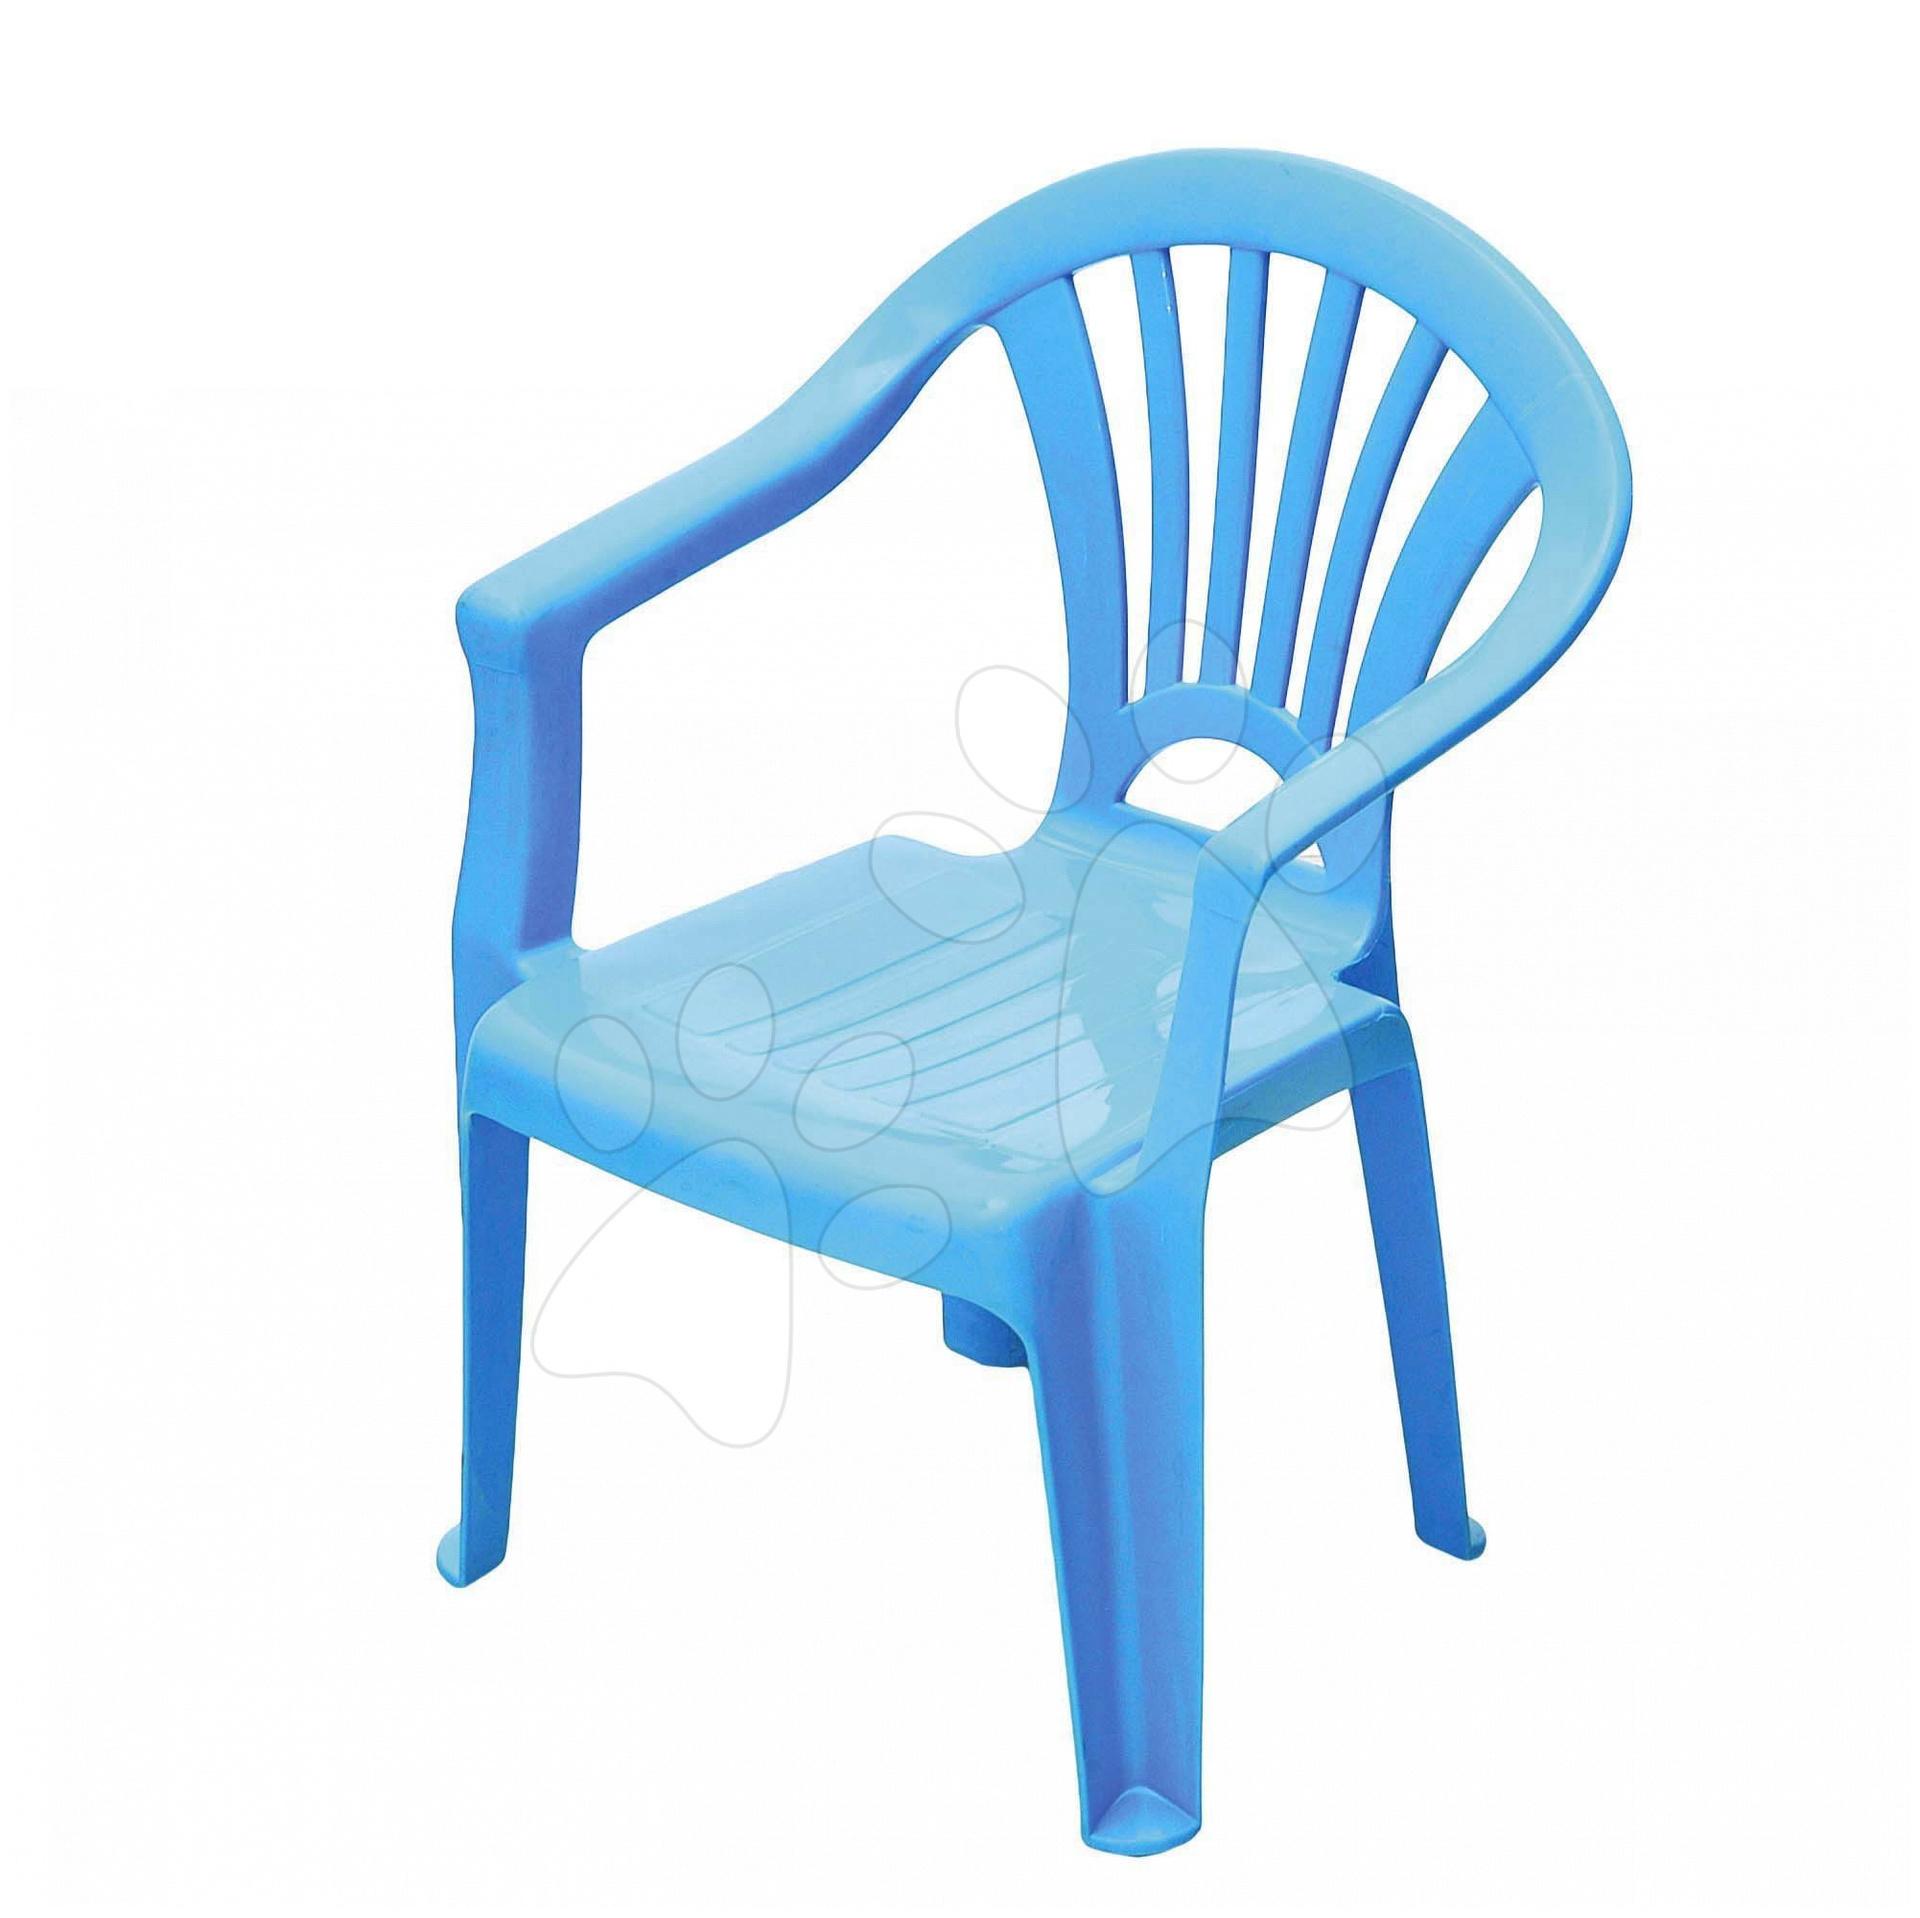 Detský záhradný nábytok - Stolička Starplast s opierkou modrá